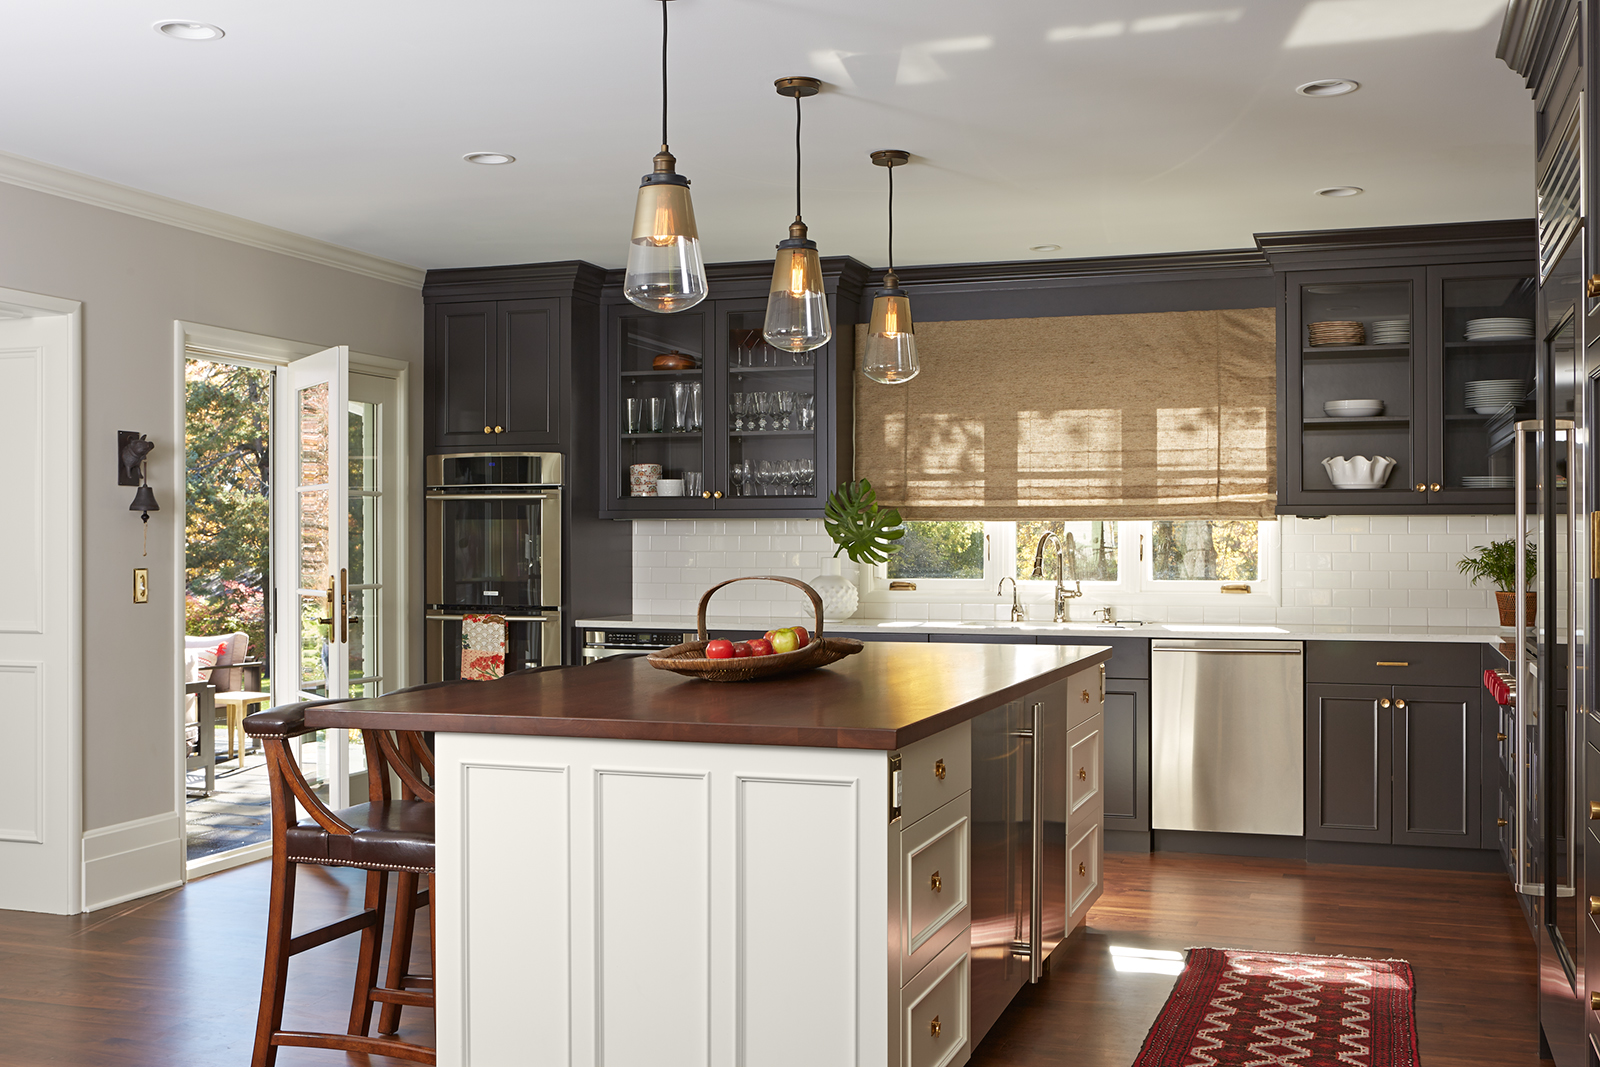 edina-kitchen-v2.jpg